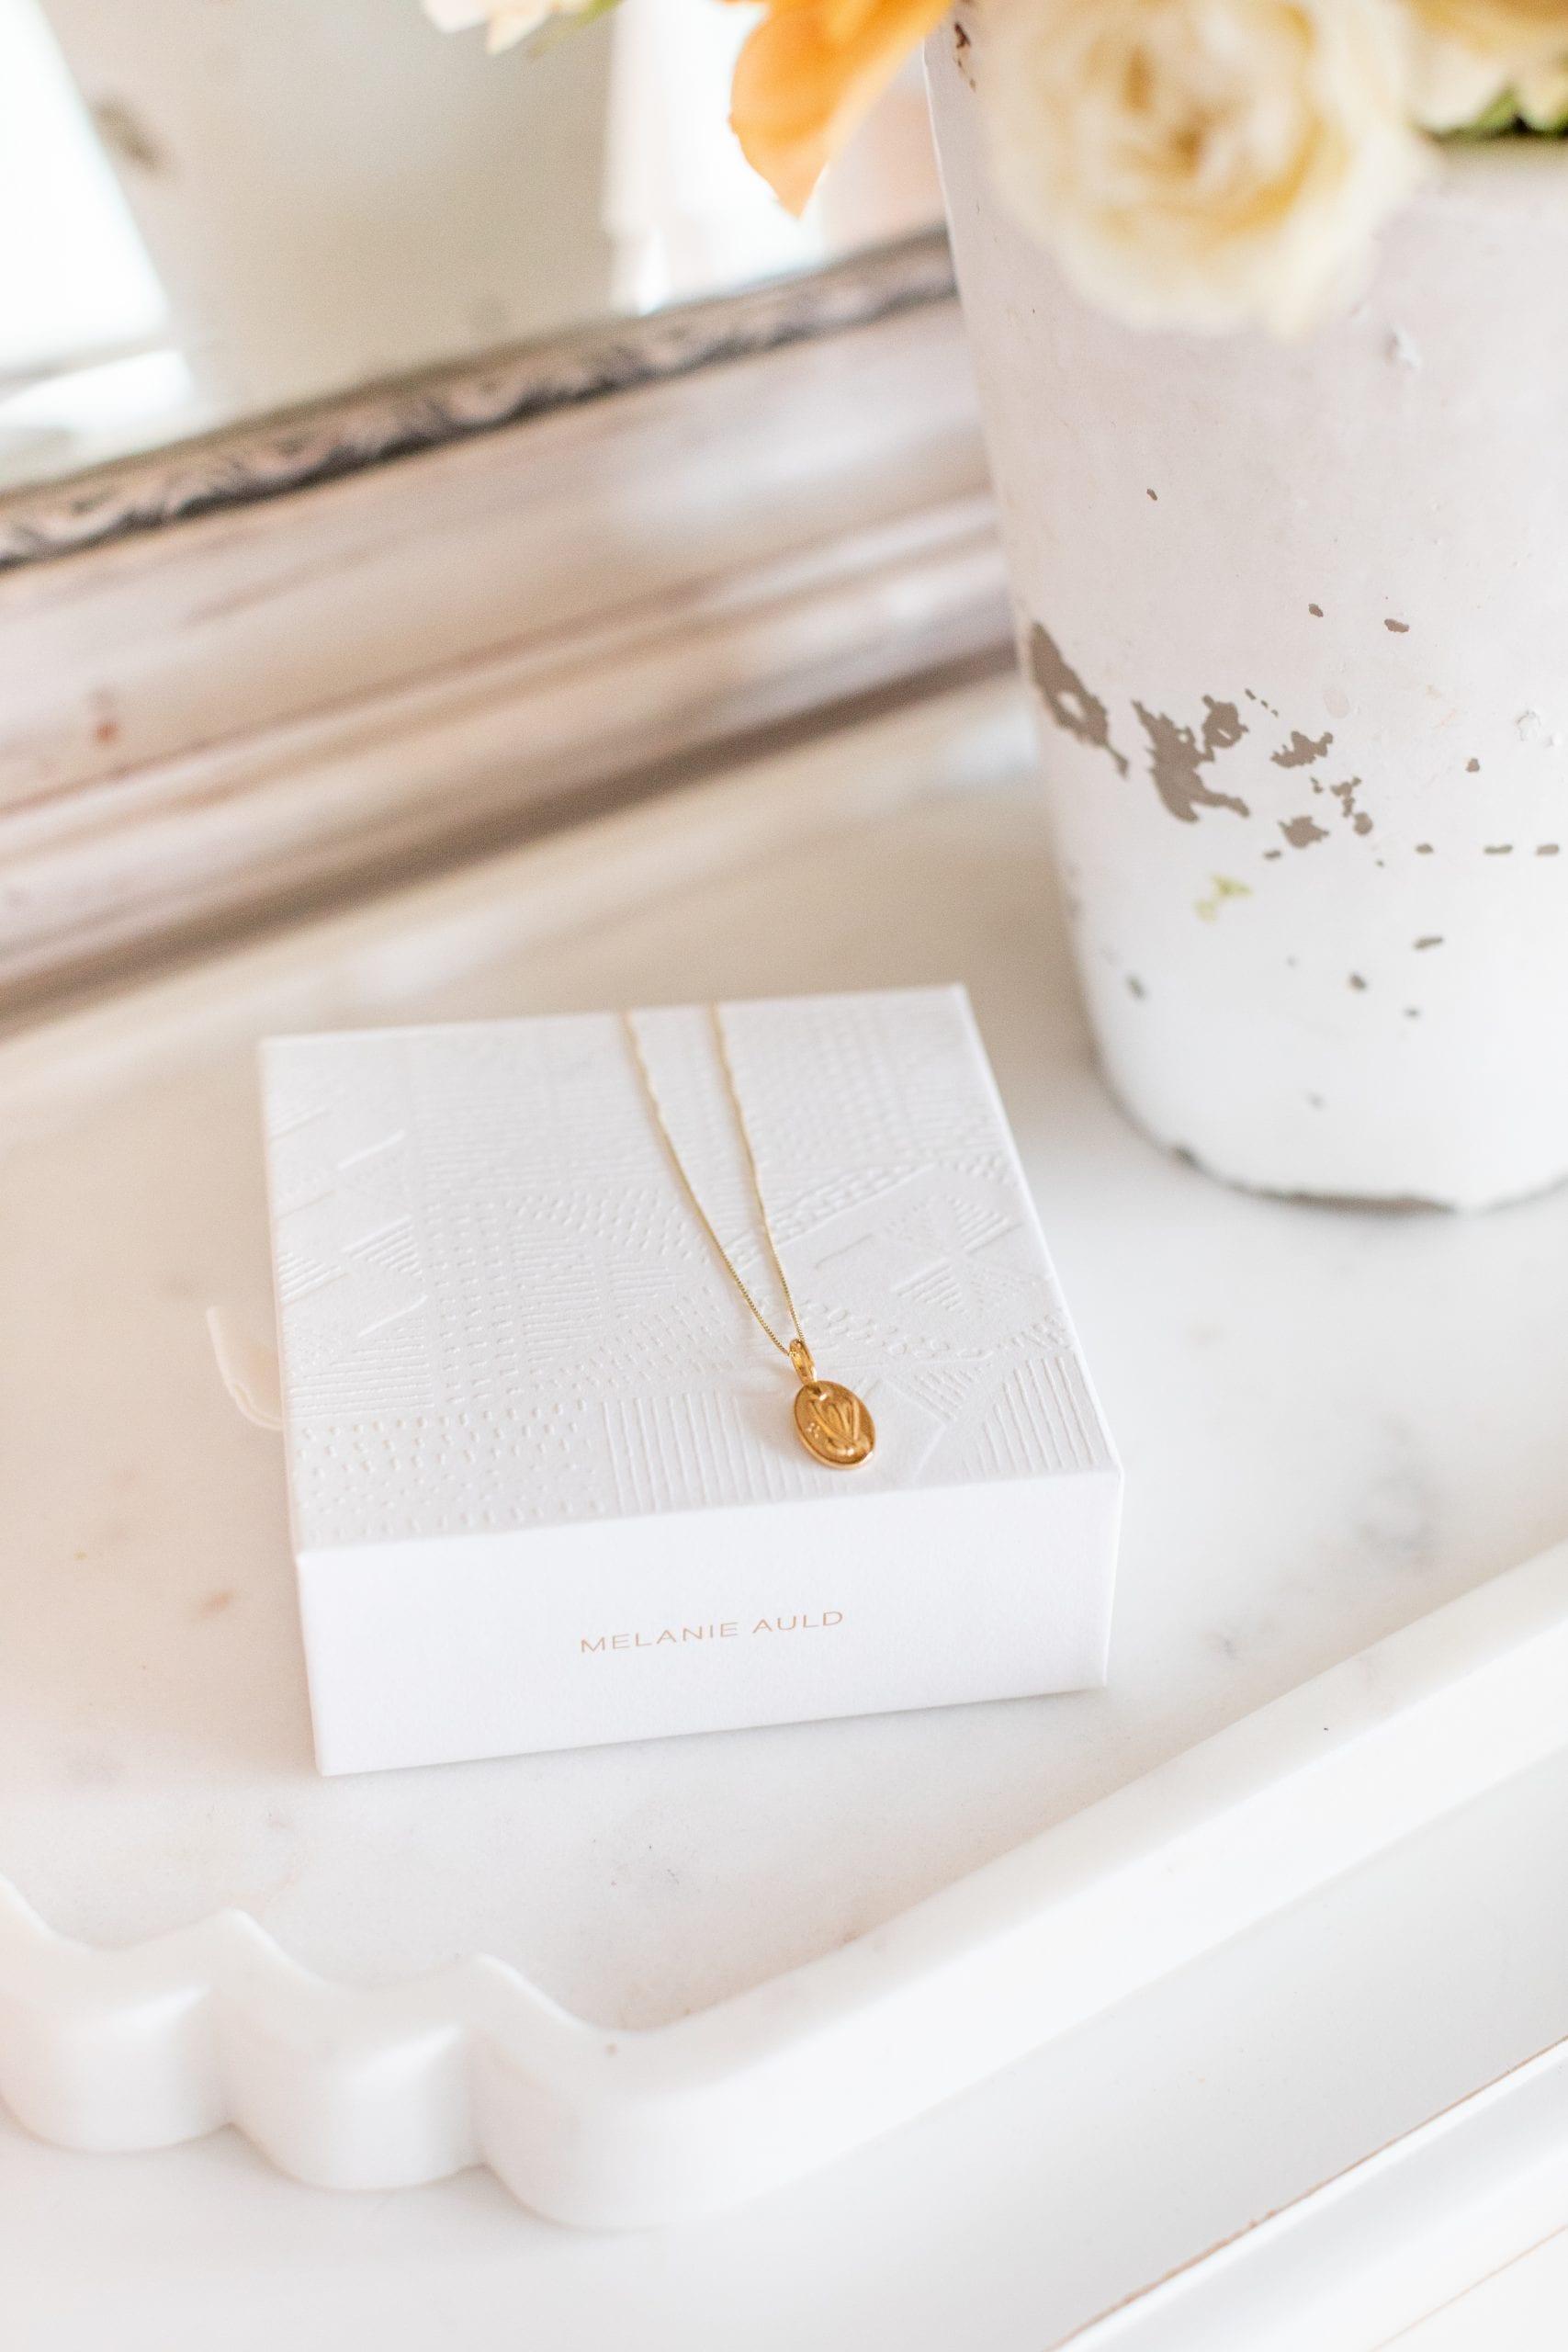 Melanie Auld Goddess Necklace